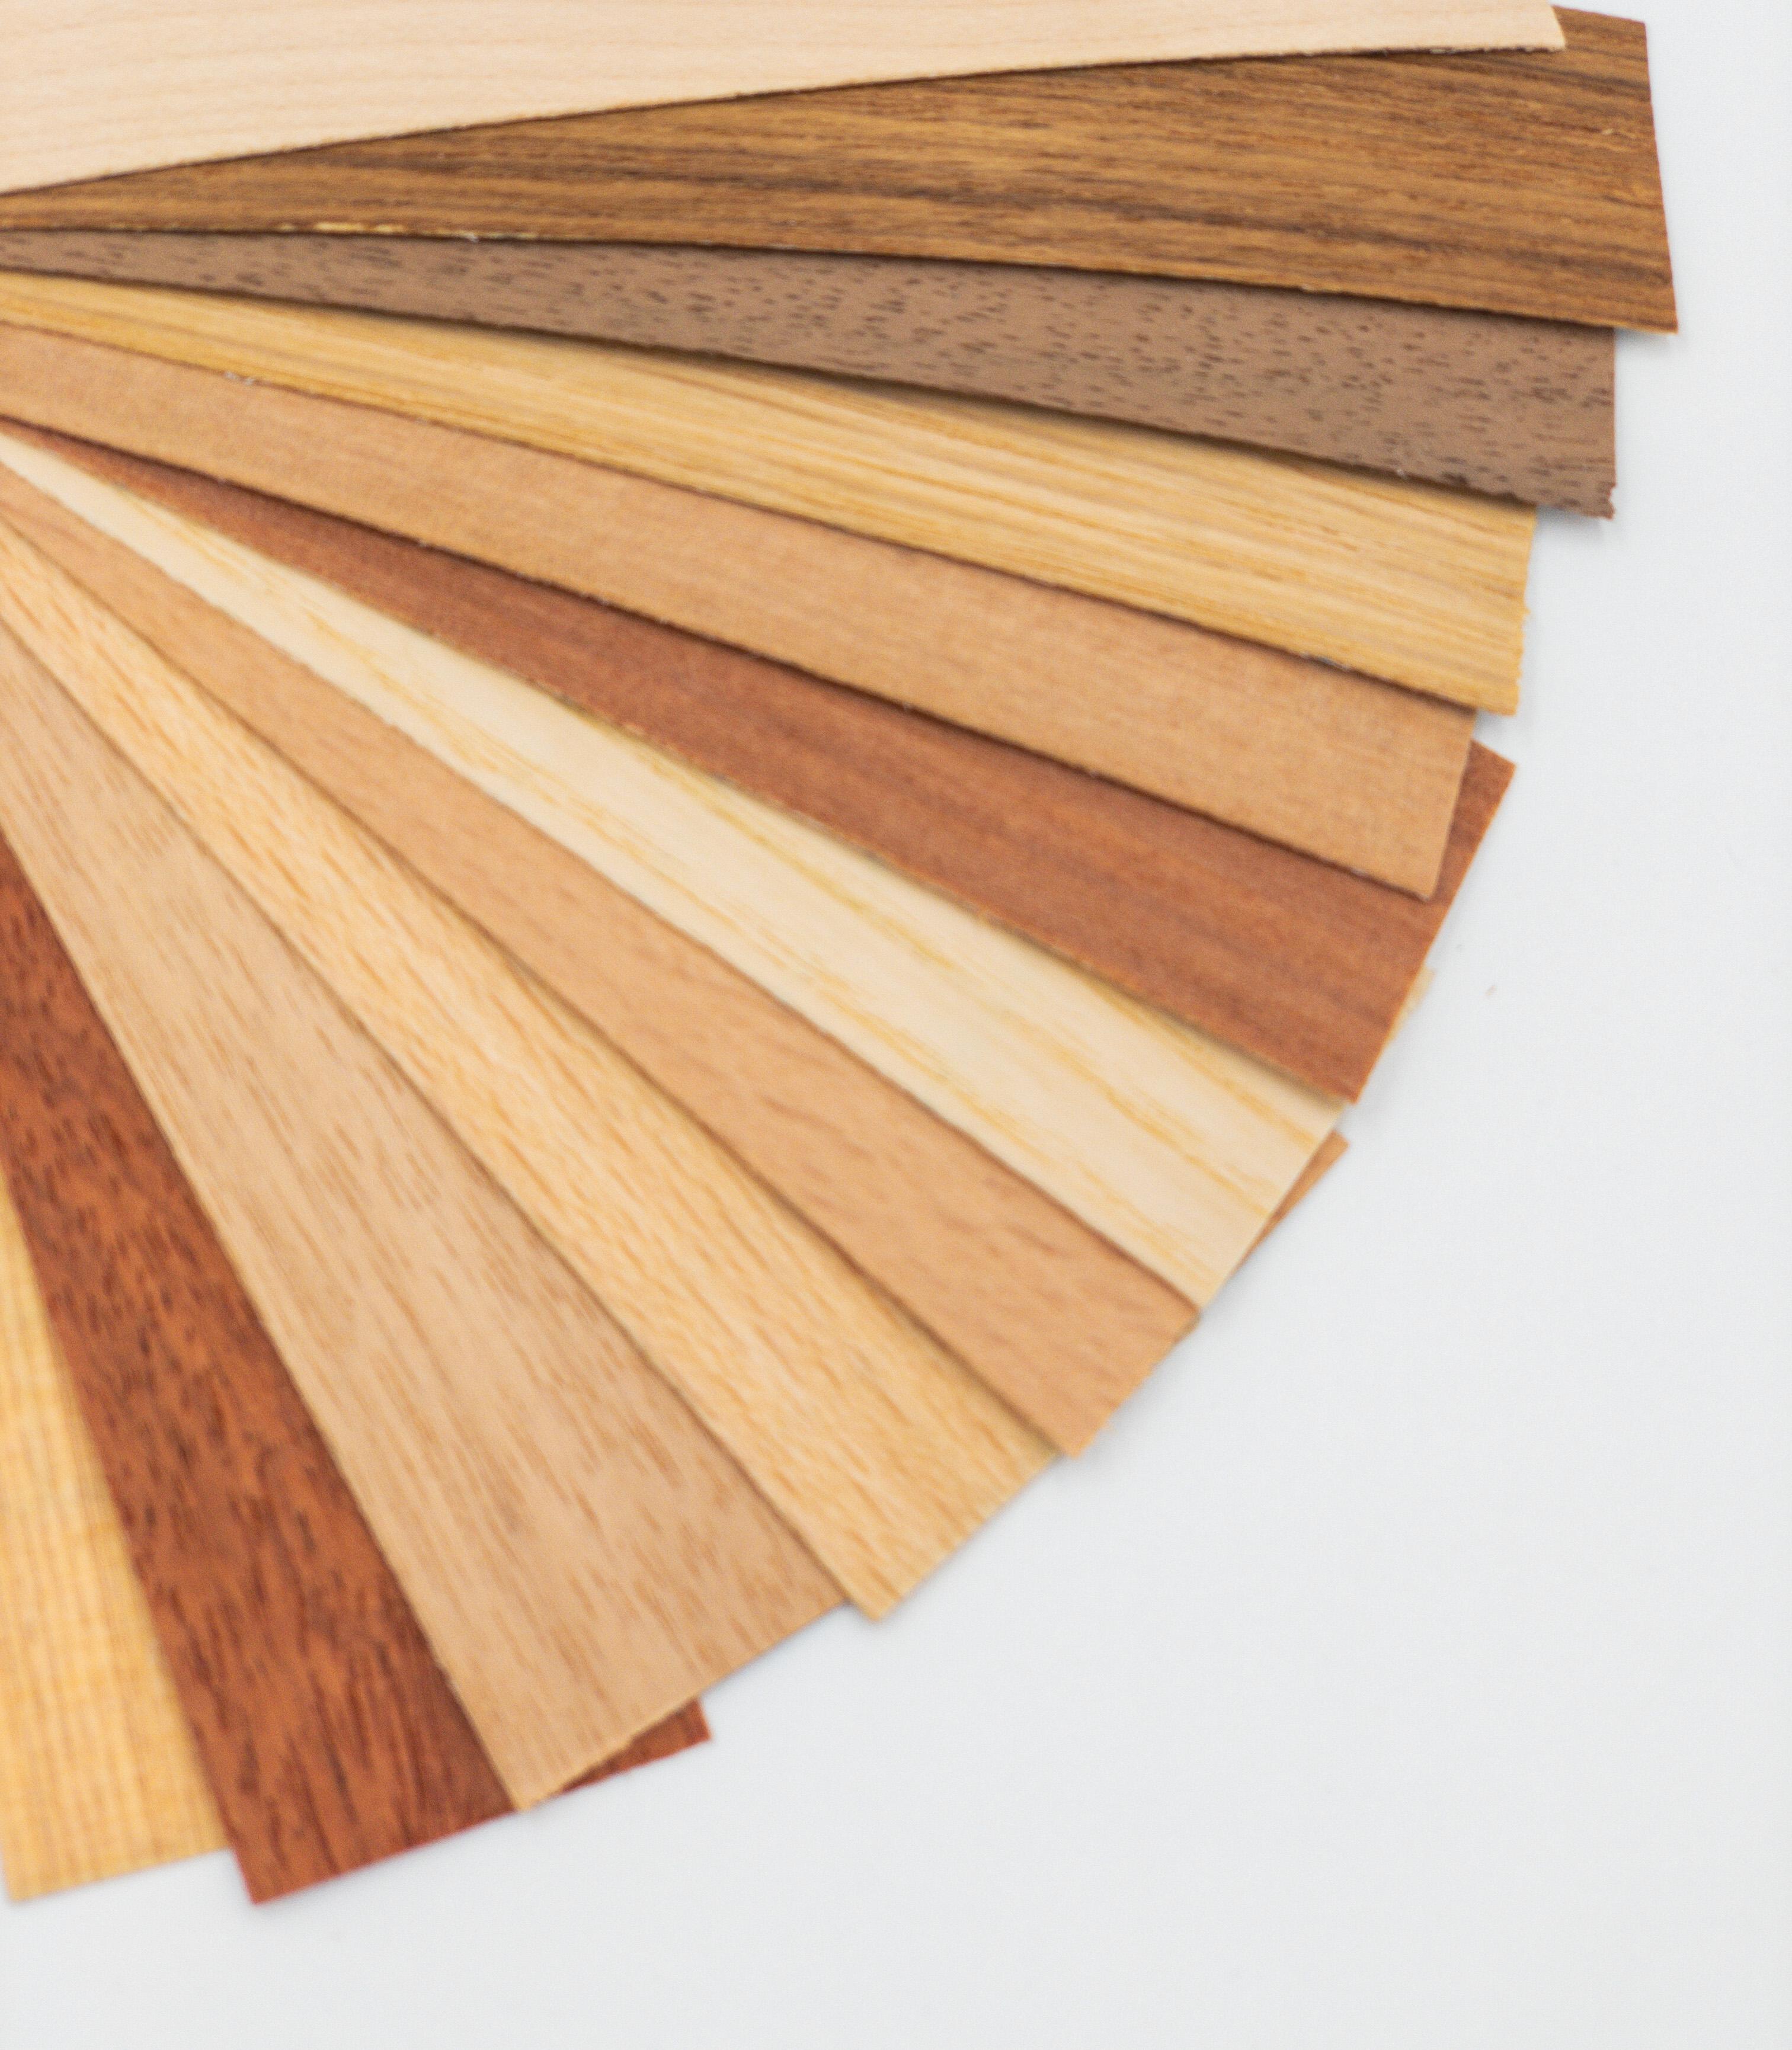 Wholesale New Pattern Wood Grain Wood Veneer Edge Banding Tape For Table Buy Wooden Pattern Edge Banding Taiwan Made Wooden Veneer Edge Banding Product On Alibaba Com